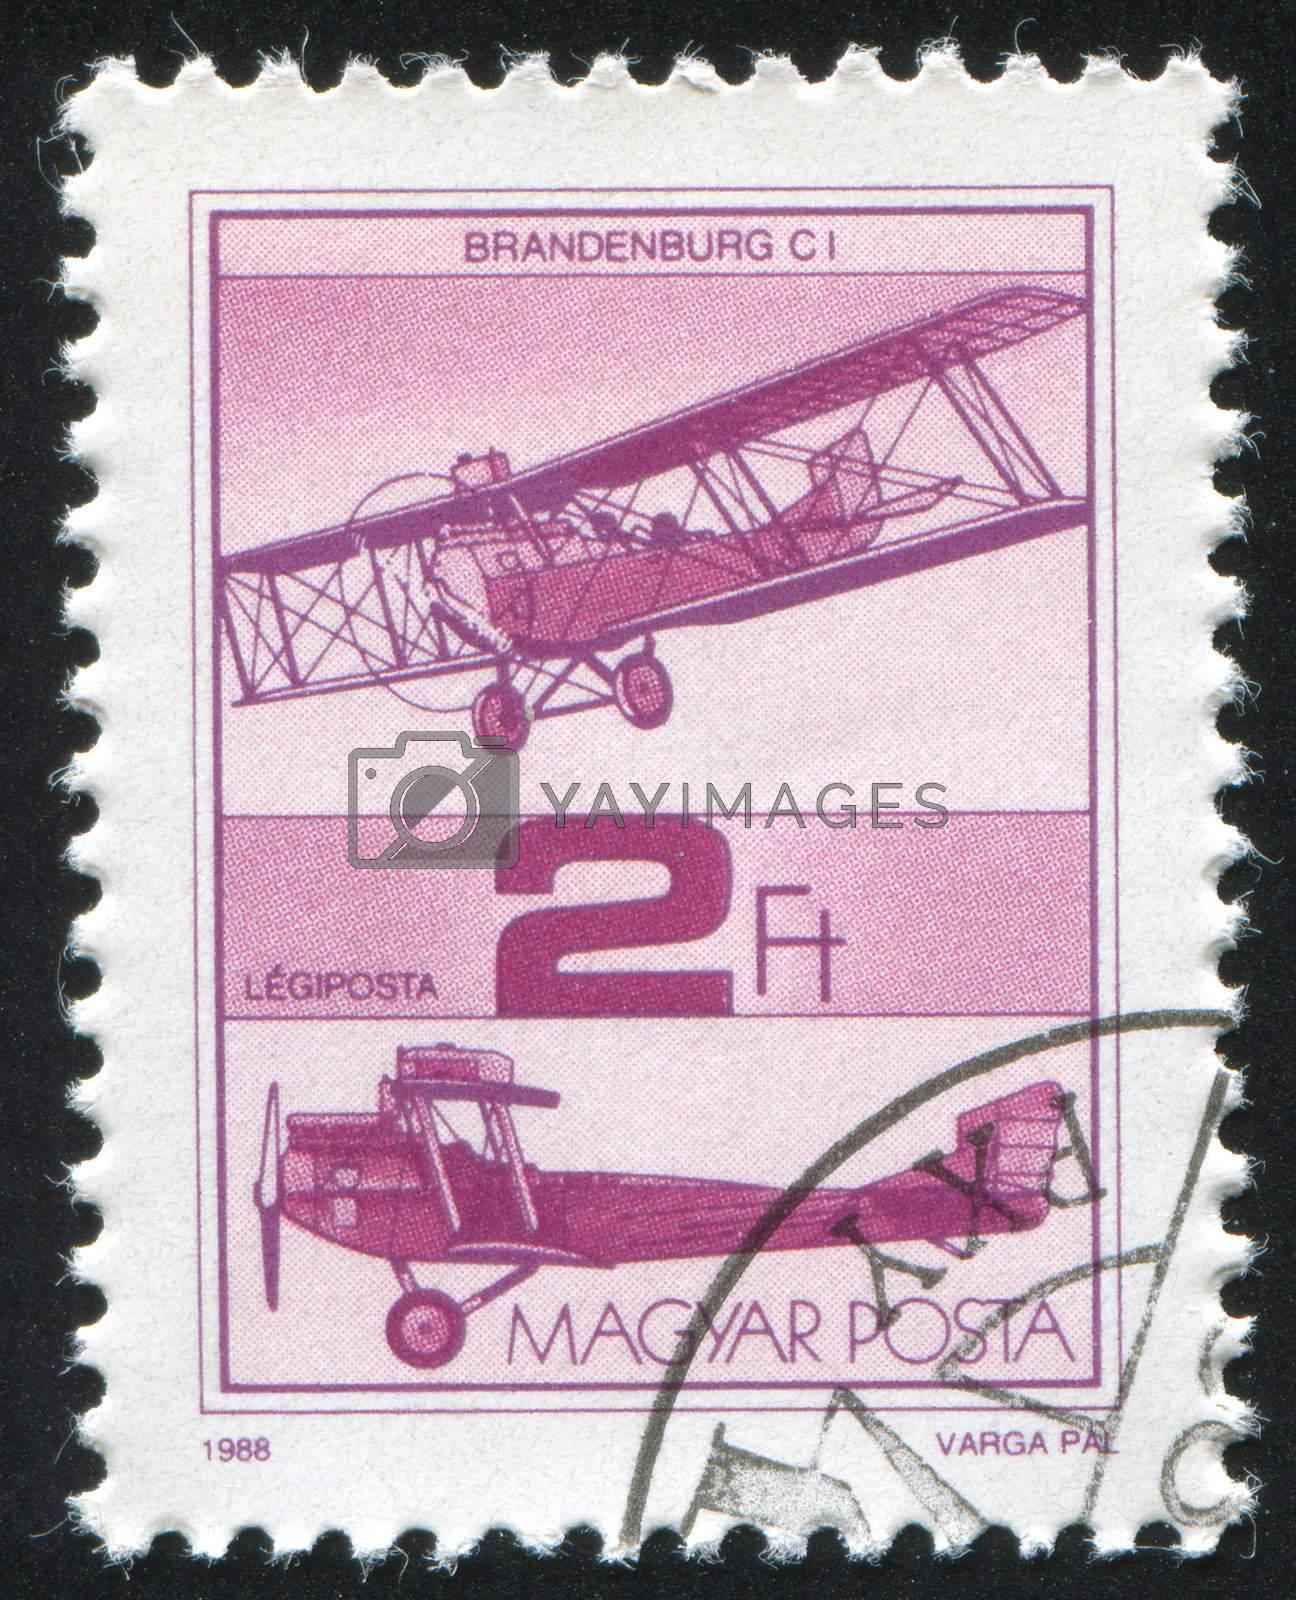 HUNGARY - CIRCA 1988: stamp printed by Hungary, shows aeroplane, circa 1988